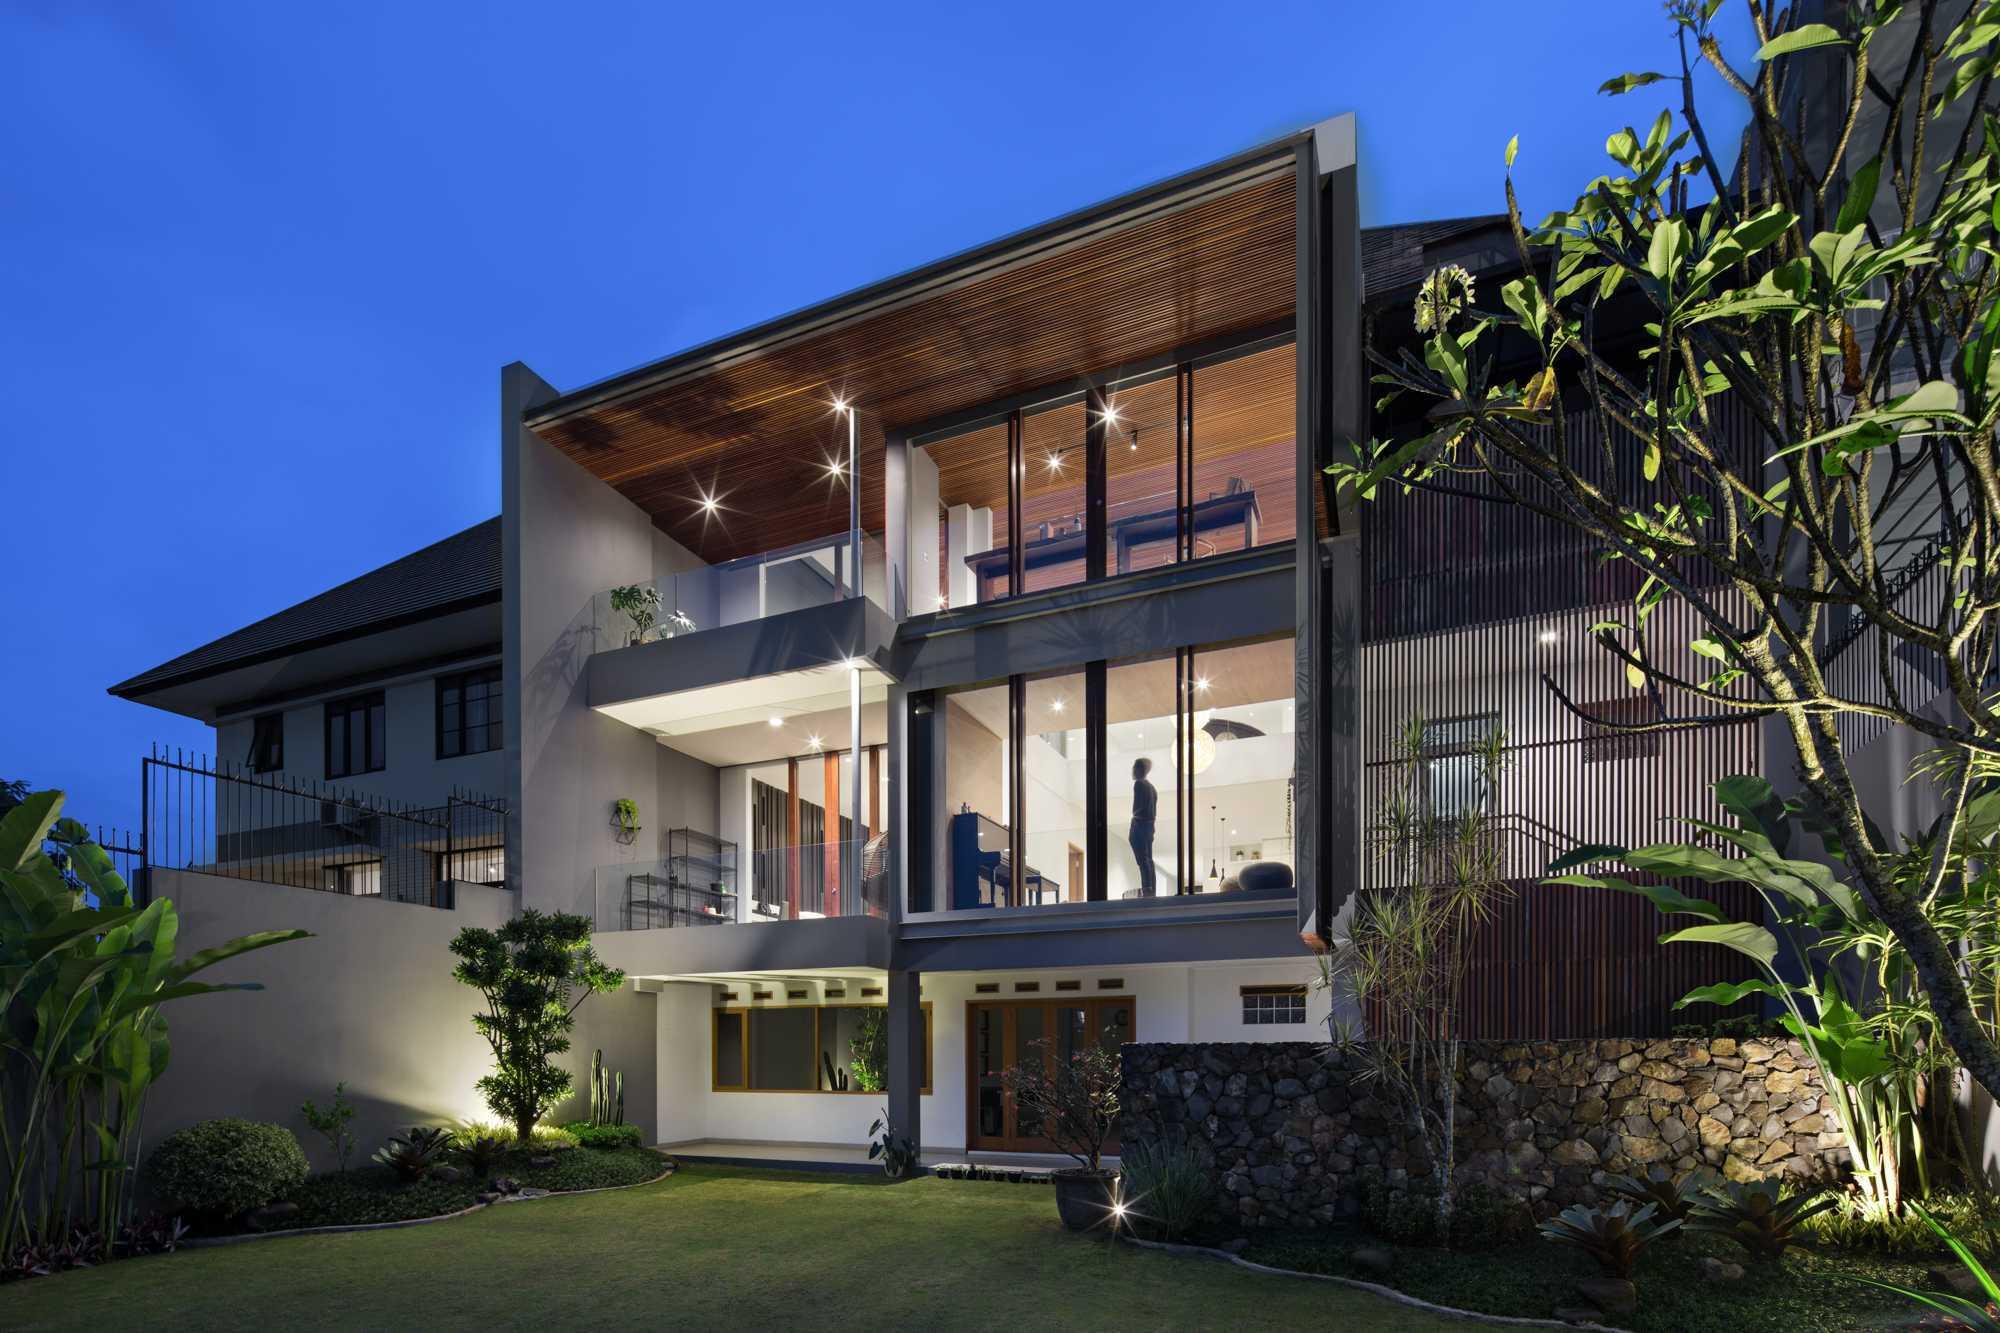 Erwin Kusuma Pitarani House Jalan Parahyangan No.42, Kertajaya, Padalarang, Kertajaya, Padalarang, Kabupaten Bandung Barat, Jawa Barat 40553, Indonesia  Erwin-Kusuma-Pitarani-House   71577